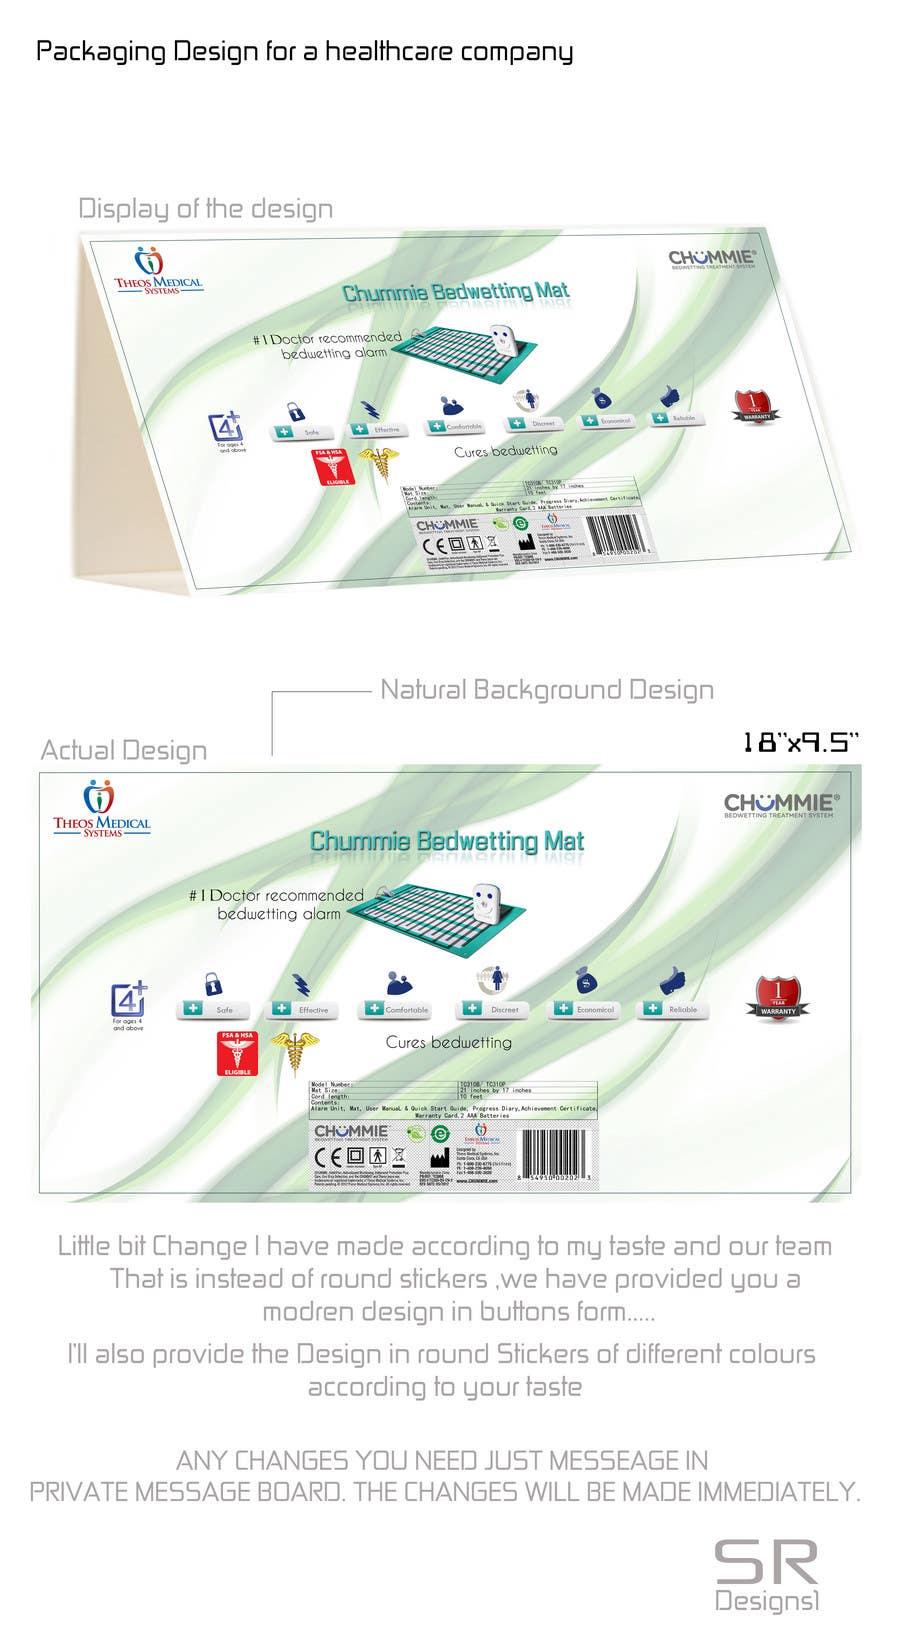 Konkurrenceindlæg #                                        13                                      for                                         Packaging Design for a healthcare company